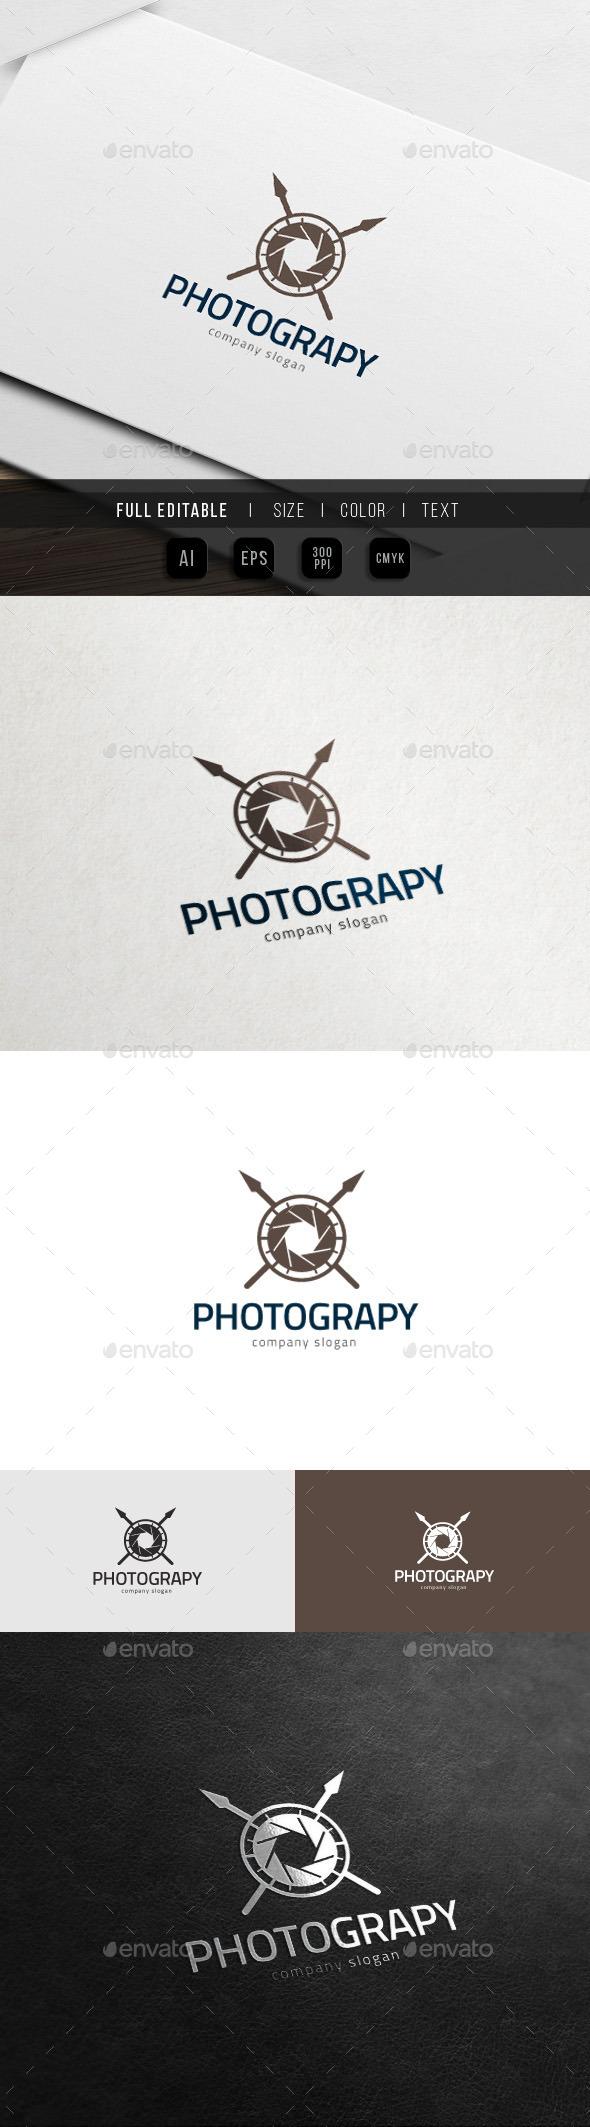 Camera War - Action Photography Logo